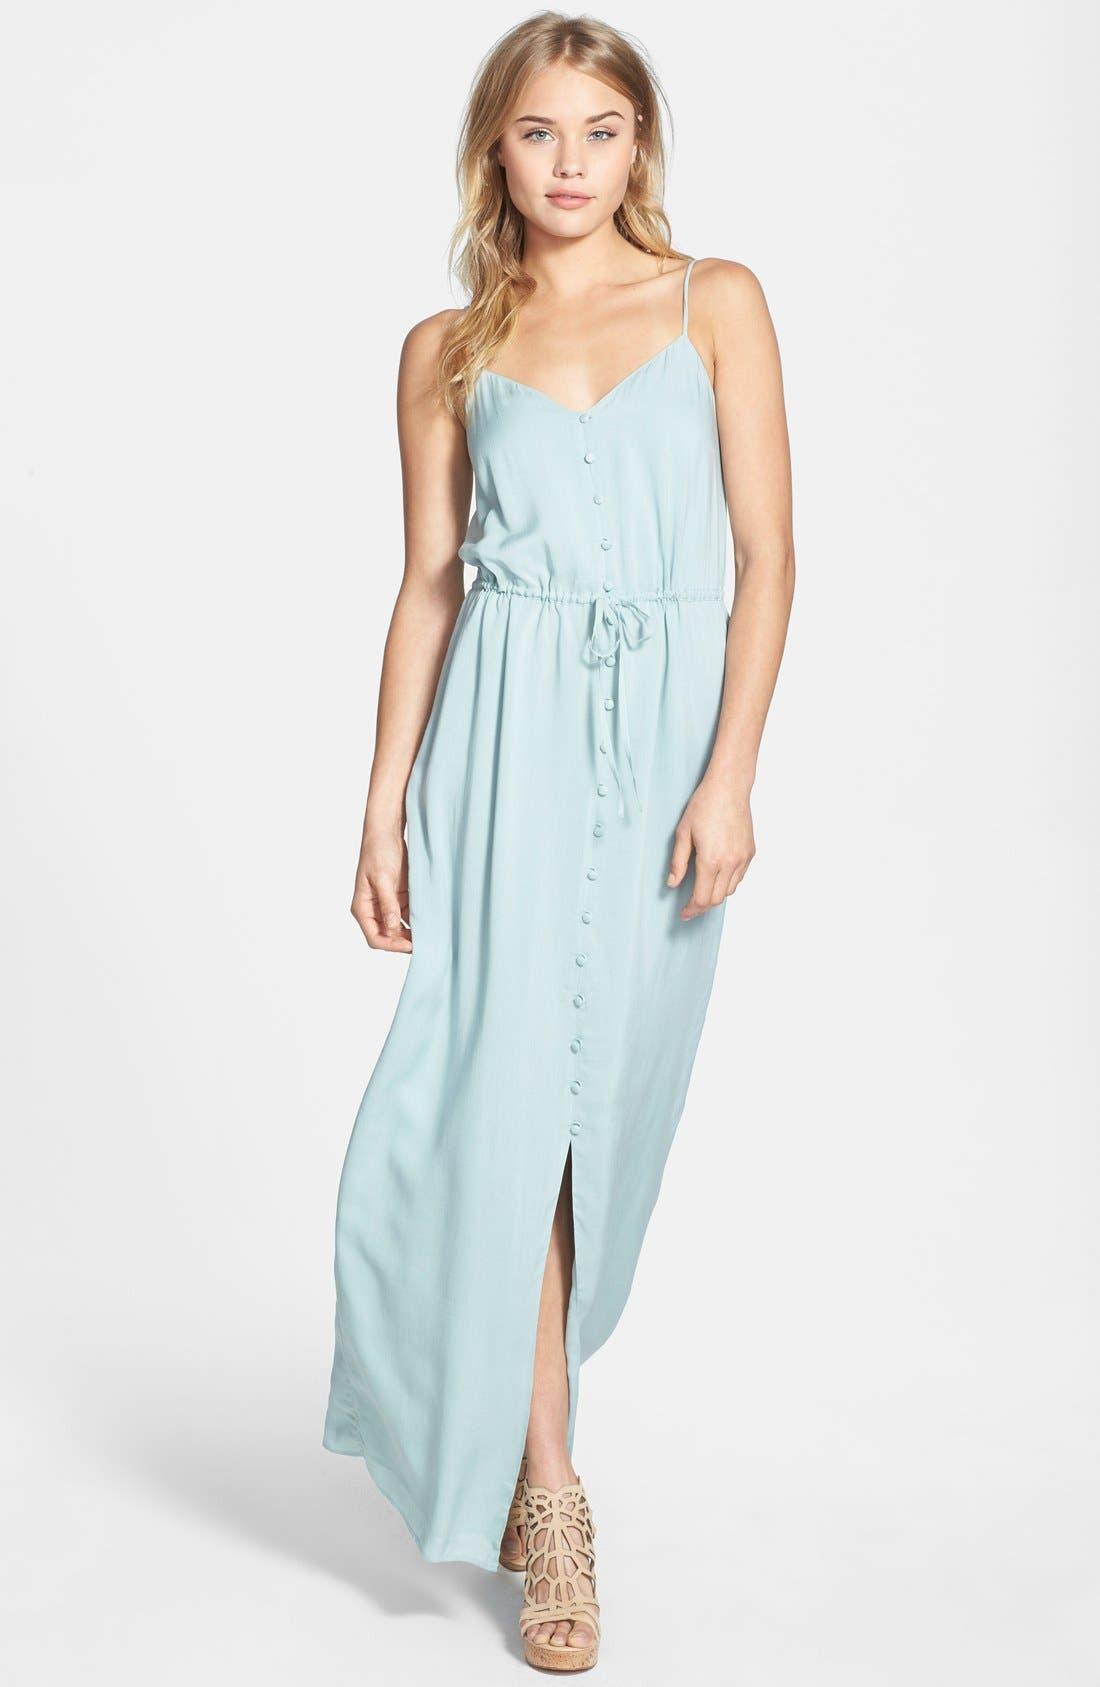 Alternate Image 1 Selected - Paige Denim 'Nina' Button Front Maxi Dress